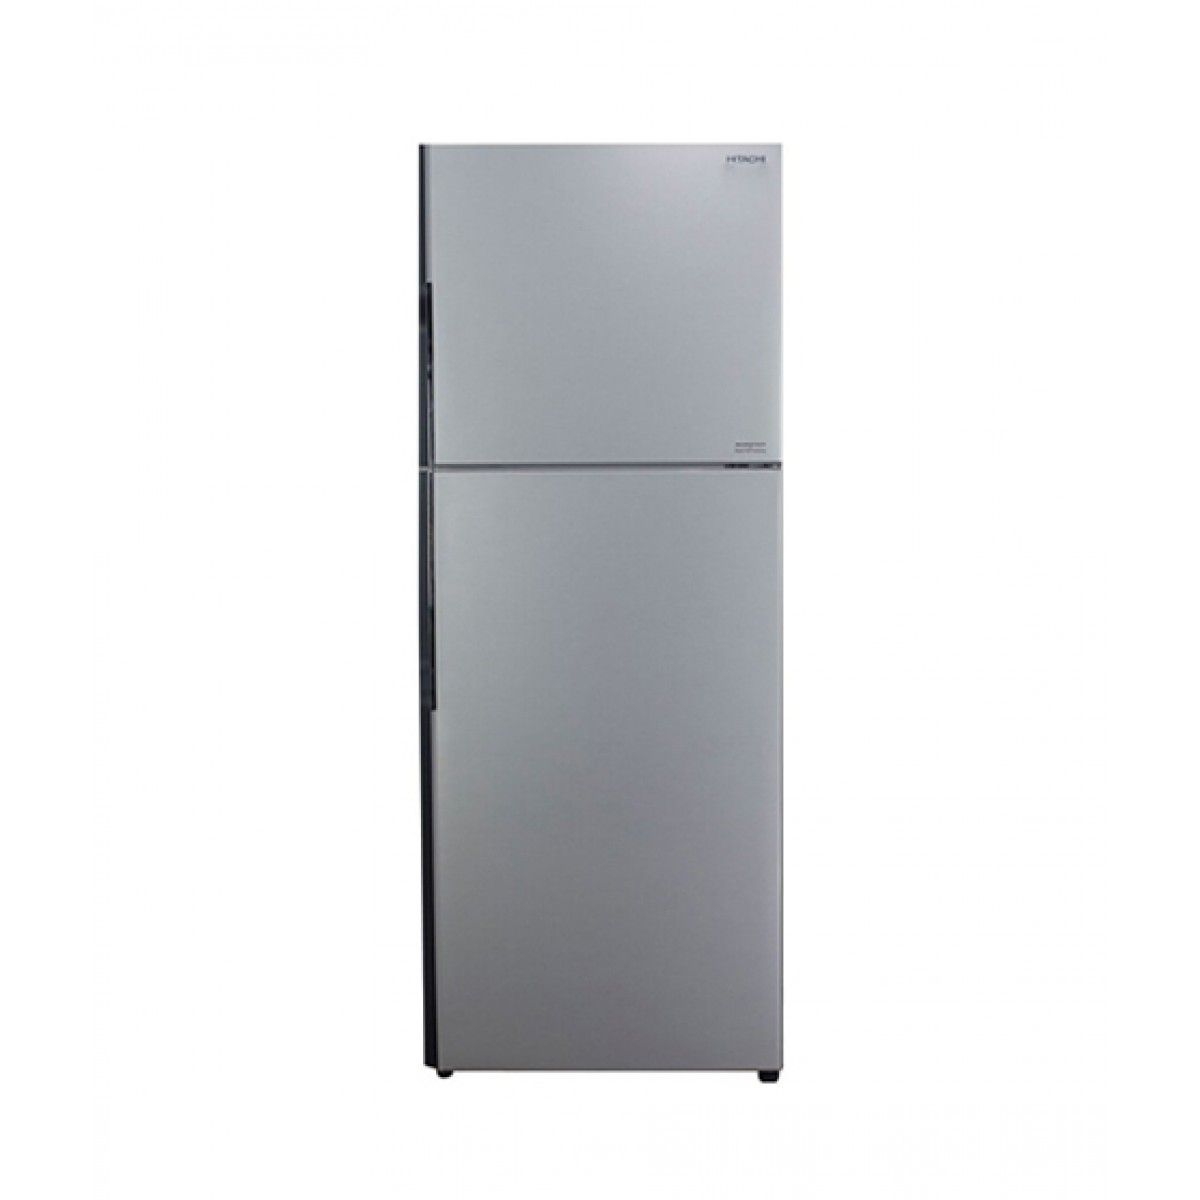 Hitachi (R-V420P3PB) Freezer-on-Top 13 cu ft Refrigerator Silver